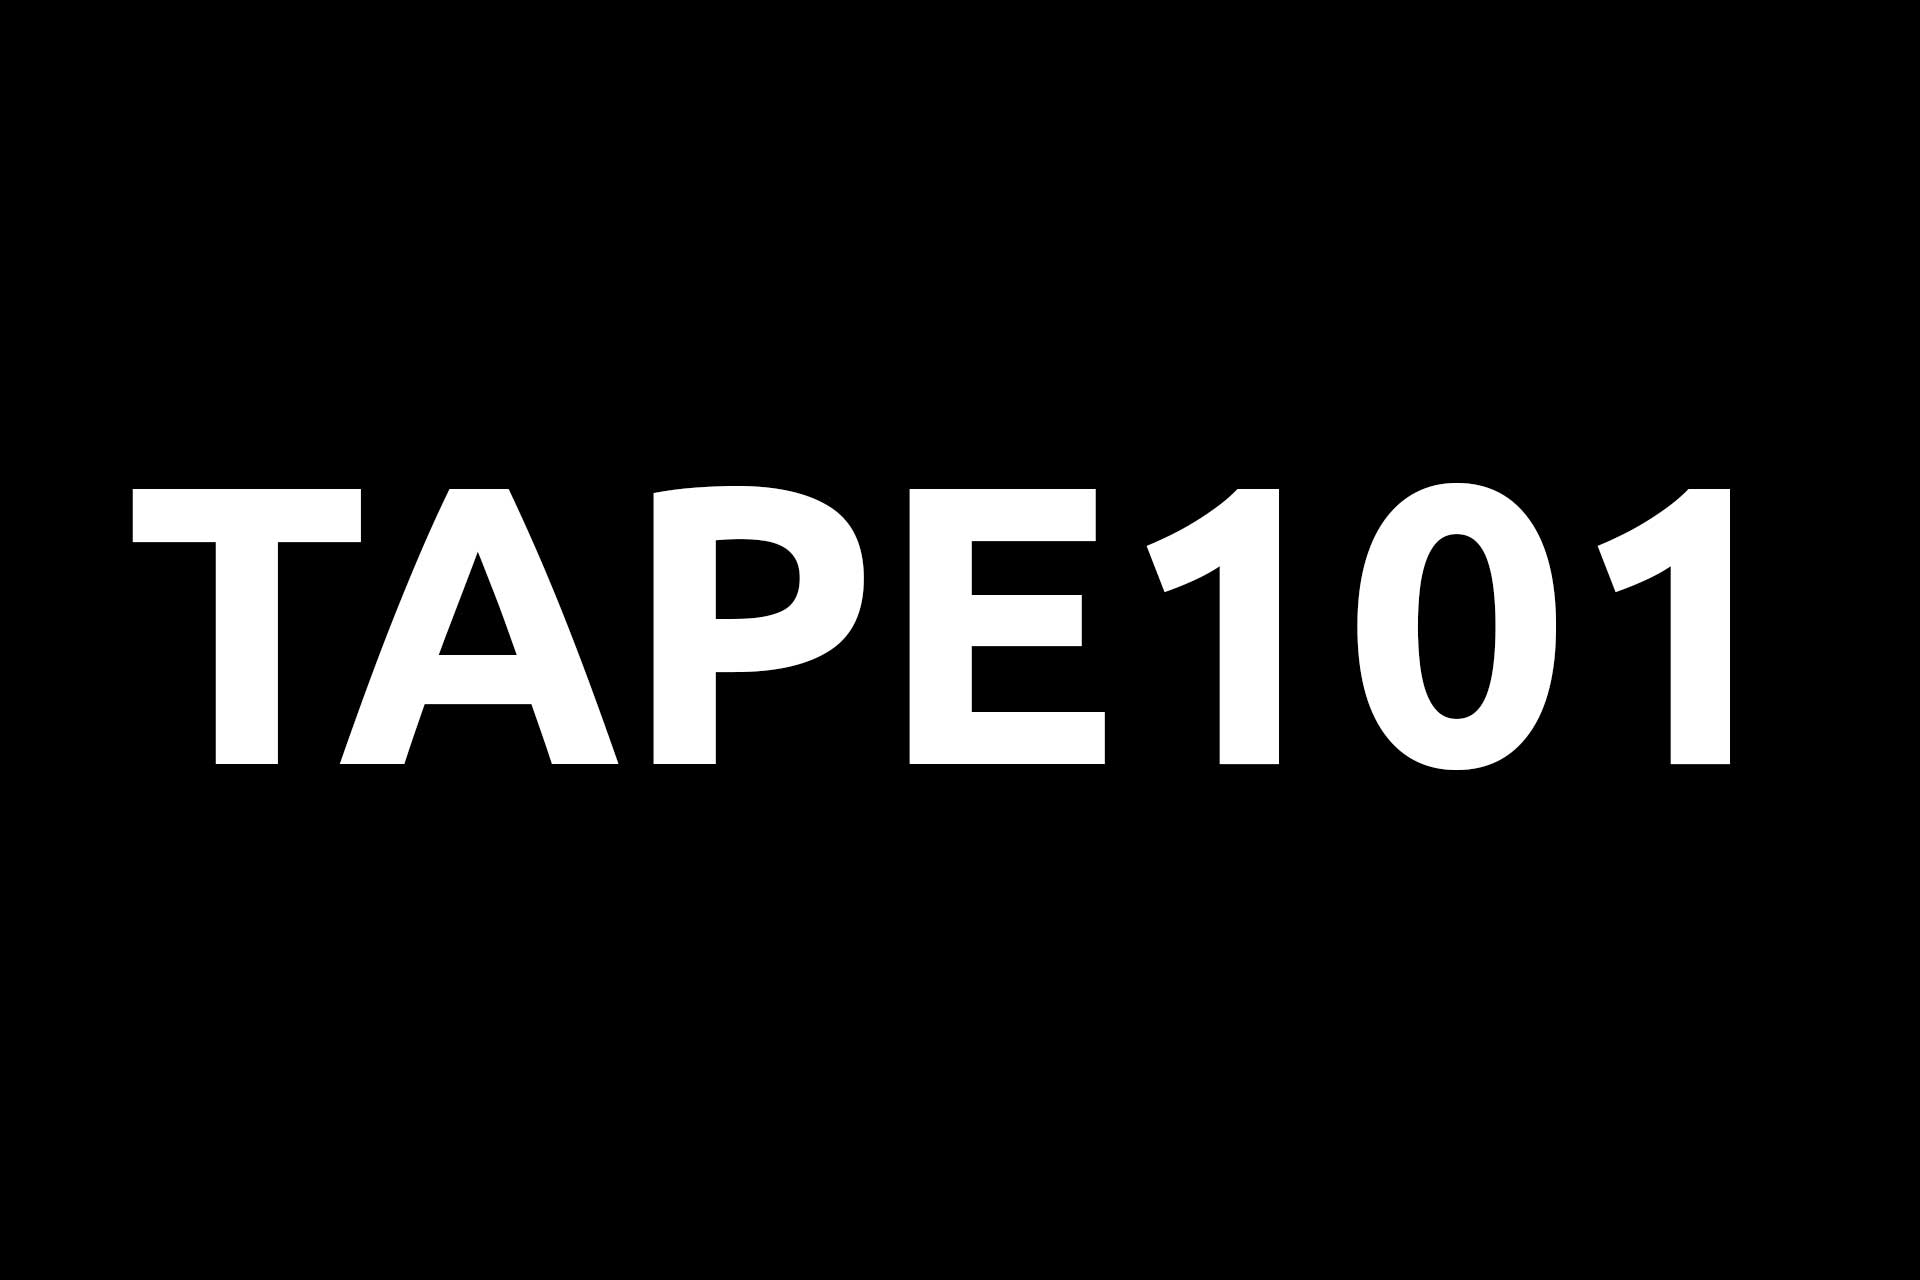 Tape101 portfolio